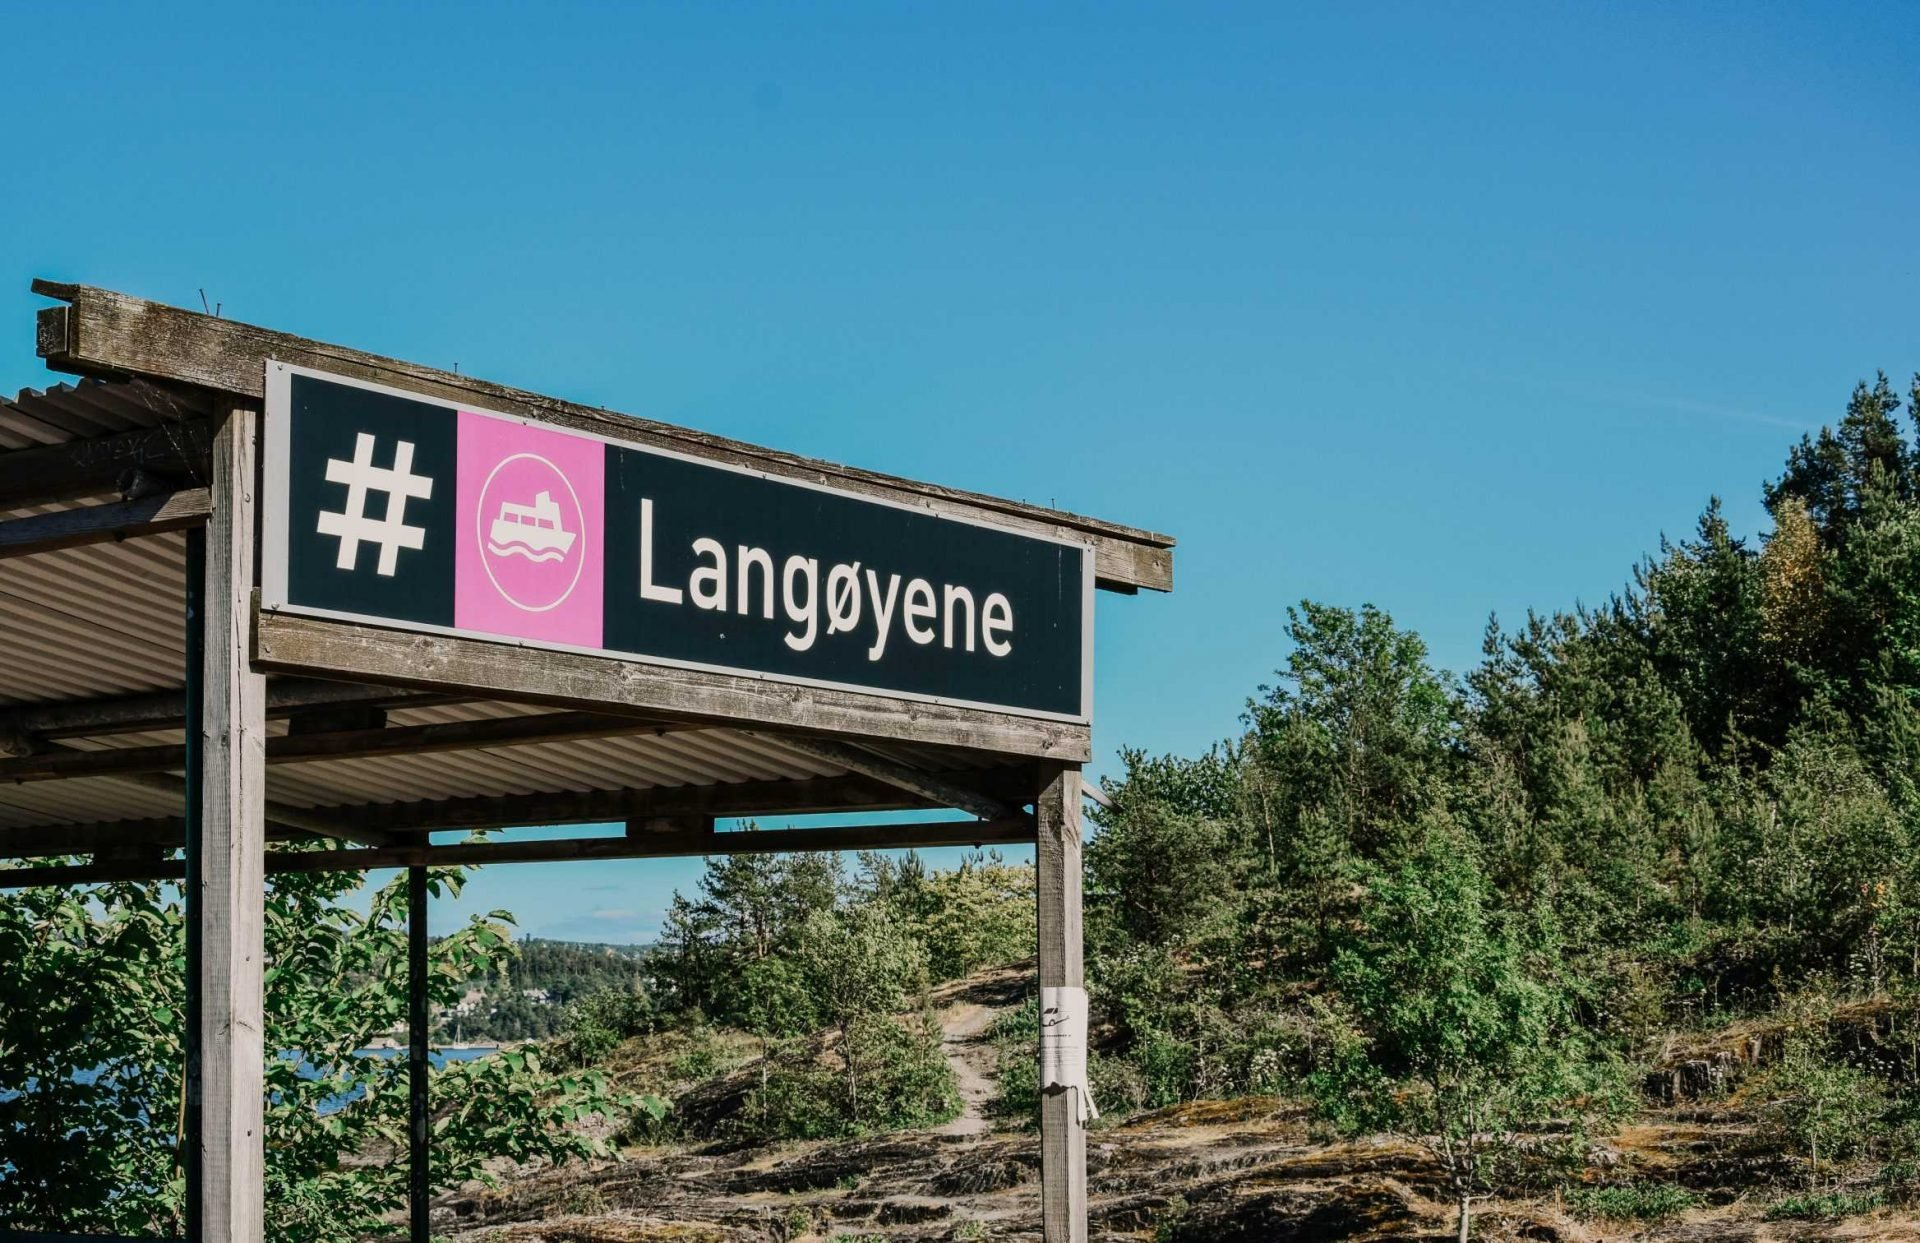 Langoyene